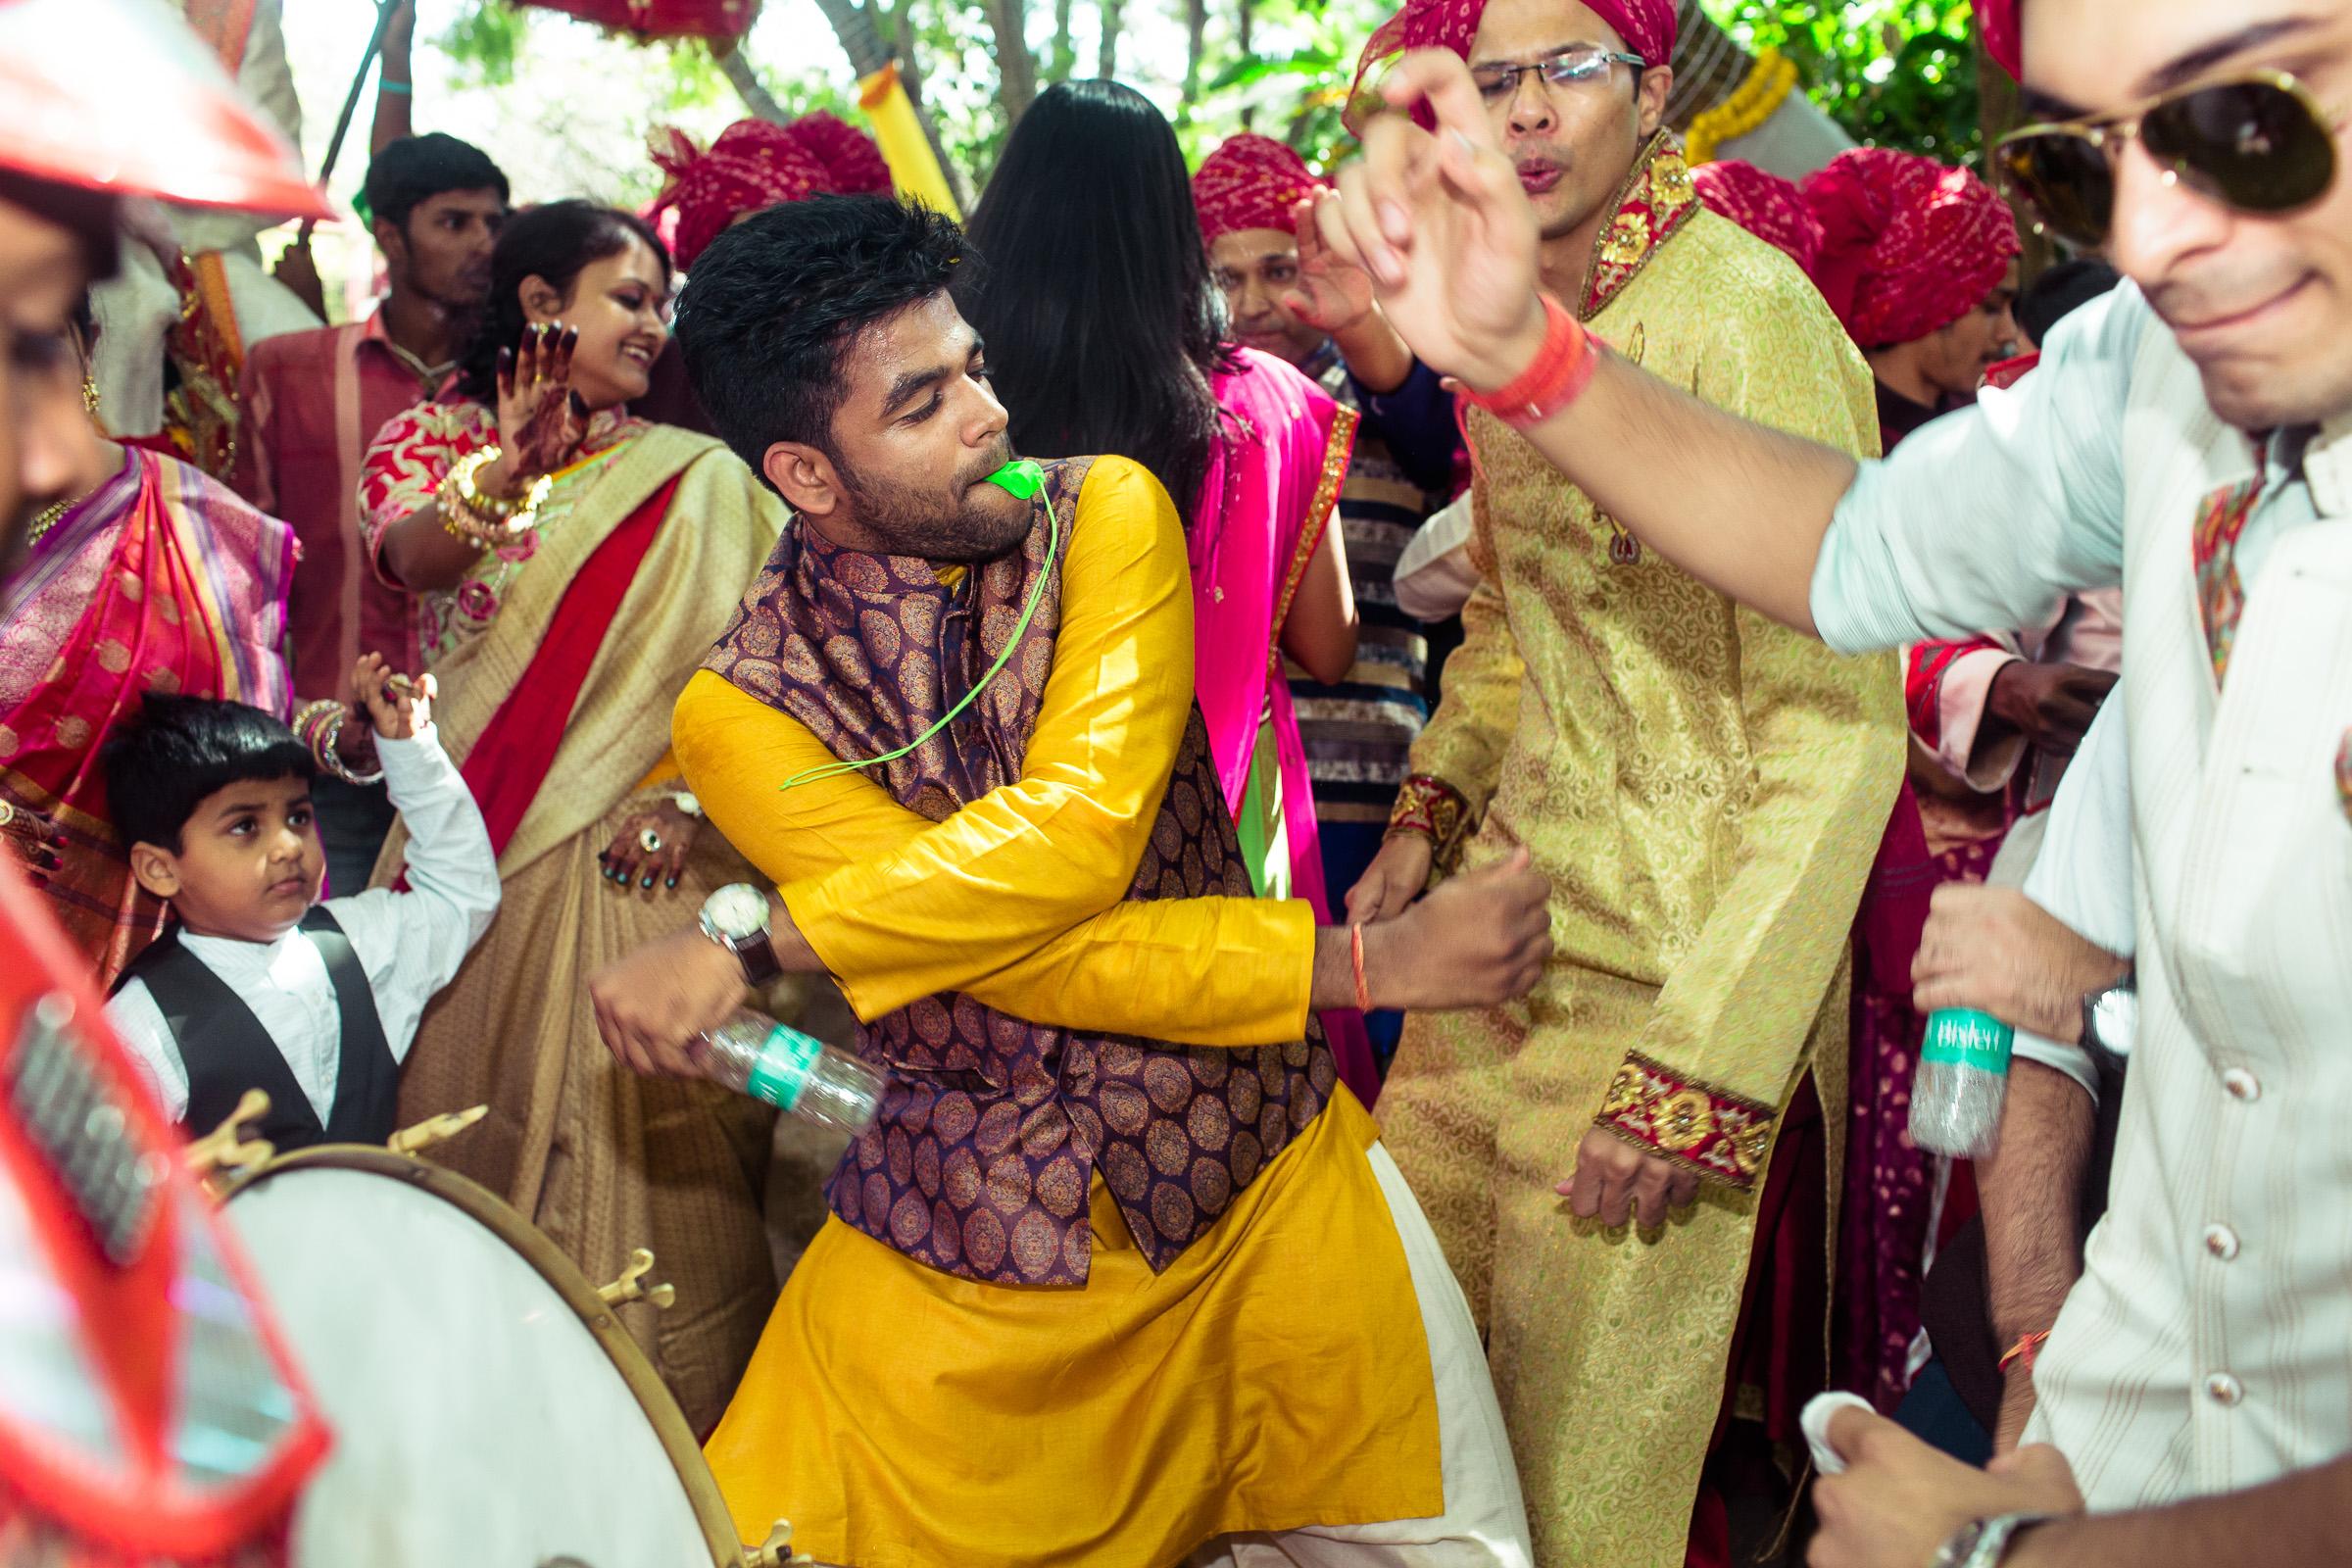 marwari-candid-wedding-photographers-bangalore-0021.jpg